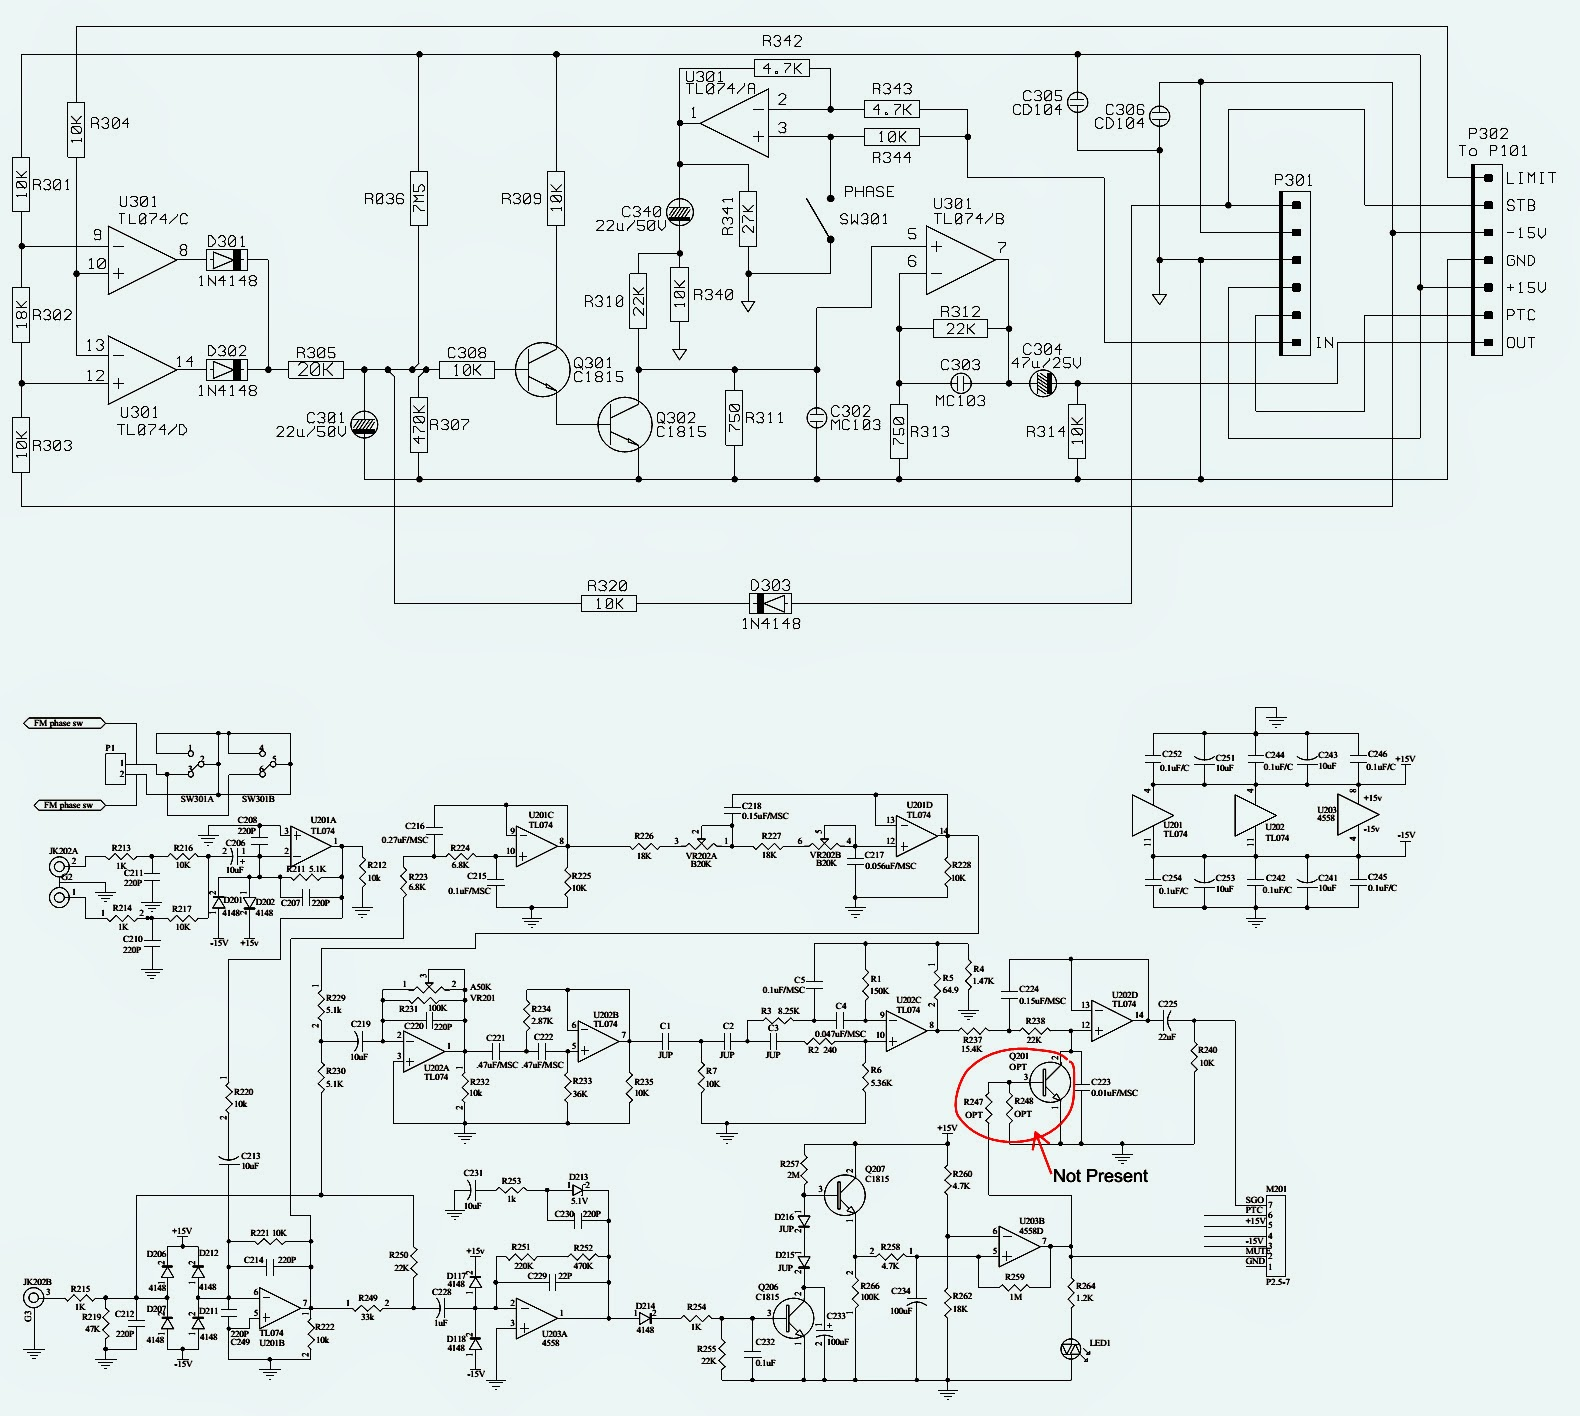 Balboa Wiring Diagram 3 Pole 4 Way Rotary Switch Jbl Series Powered Sub 10  Circuit